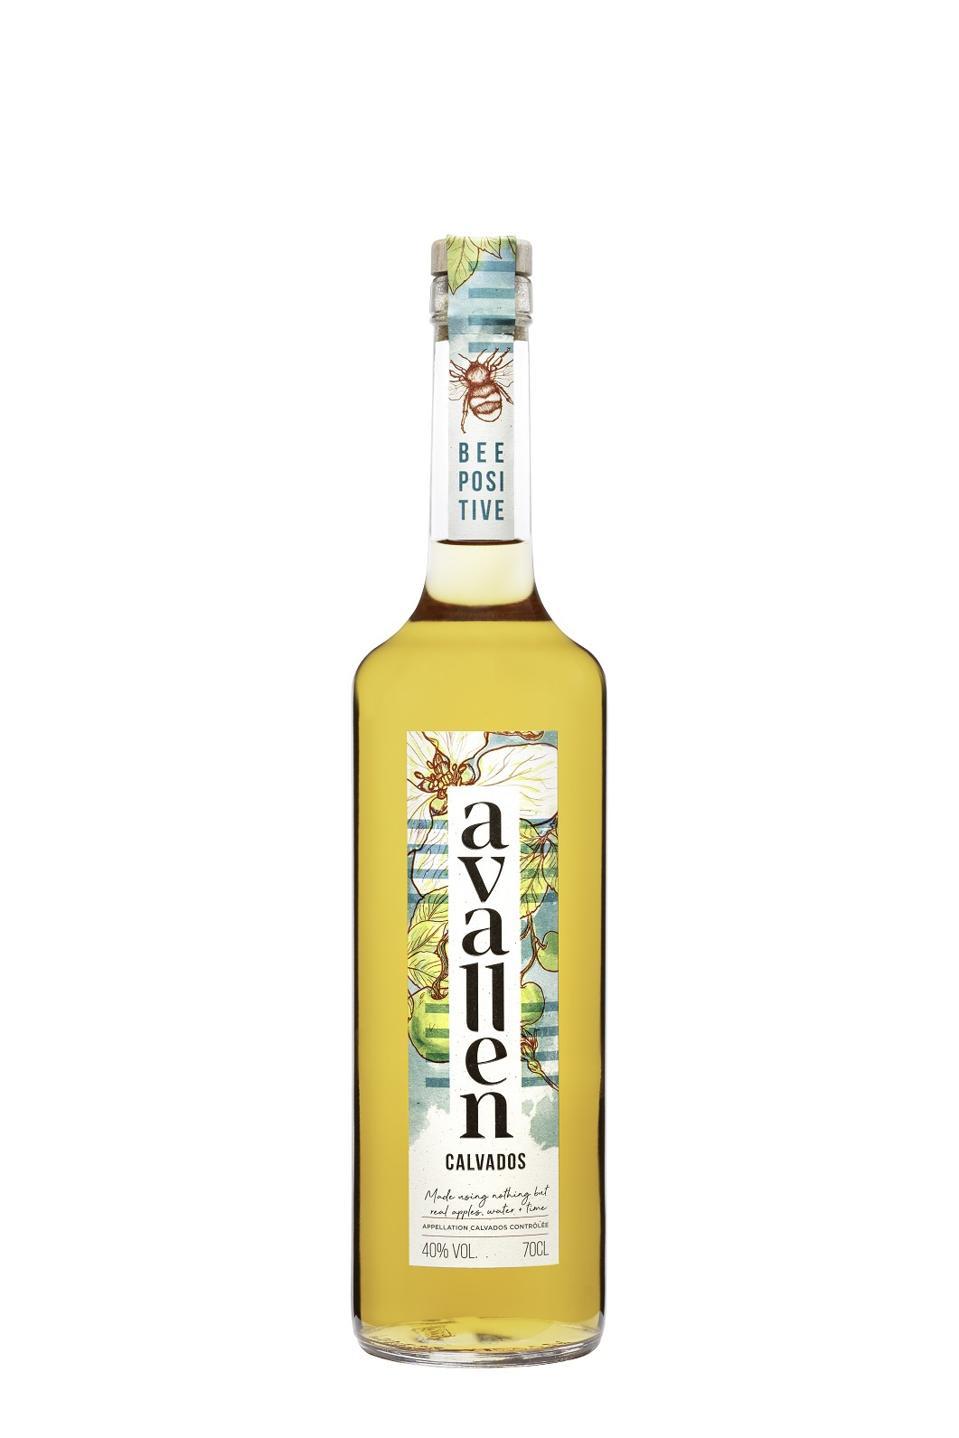 Avallen bottle